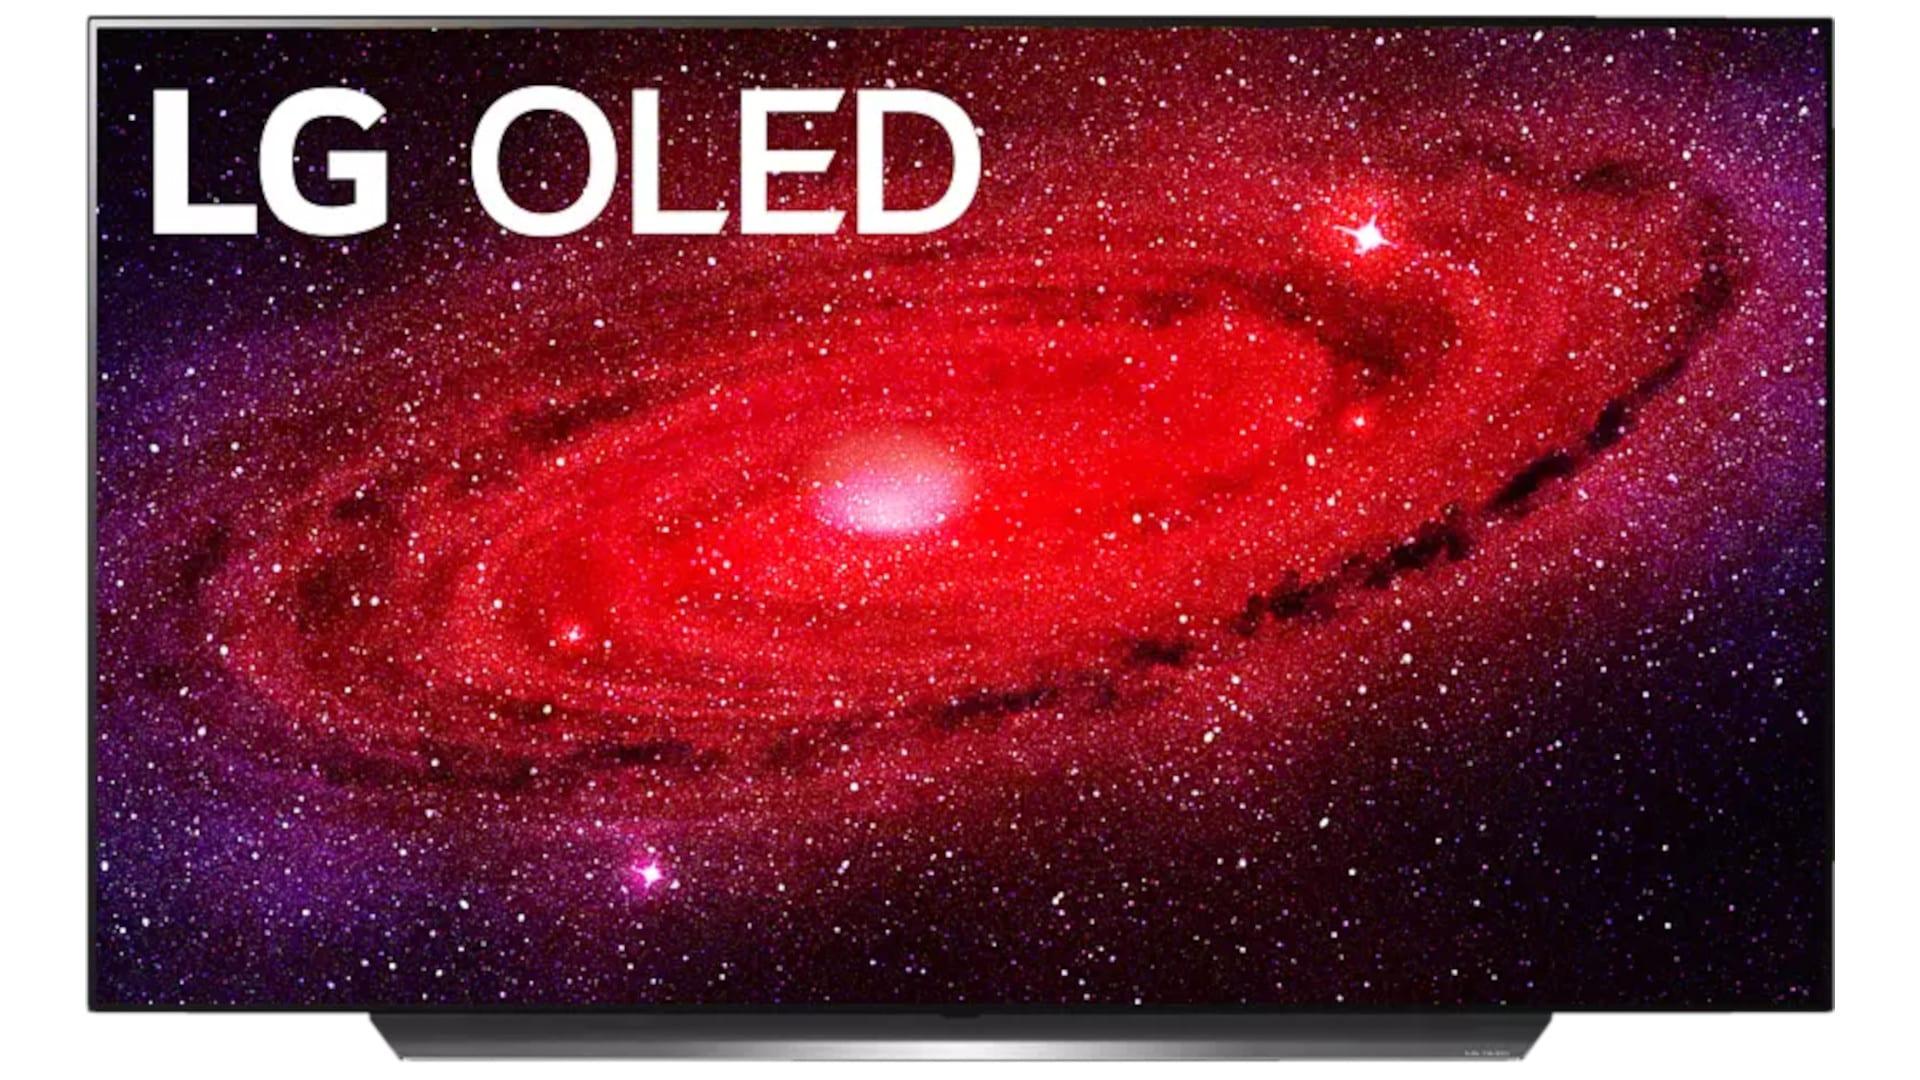 LG Fernseher Otto EM-Deal